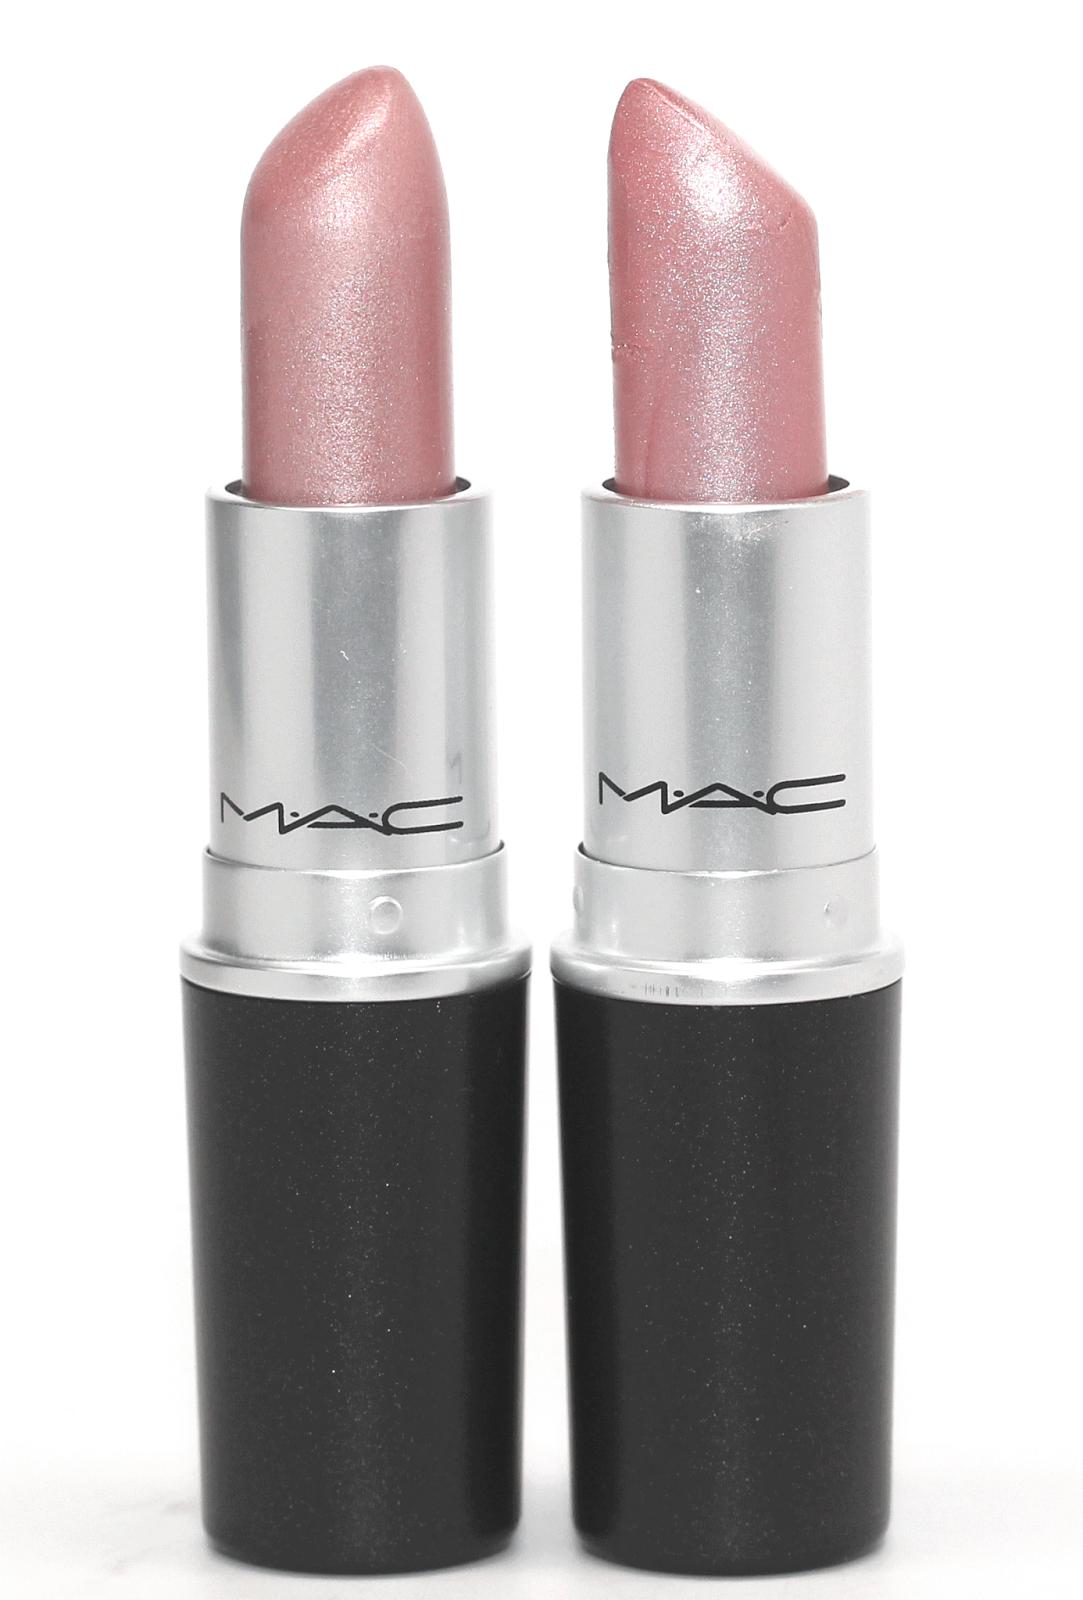 Mac cosmetics lipstick collection christine iversen for Mac cosmetics diva lipstick